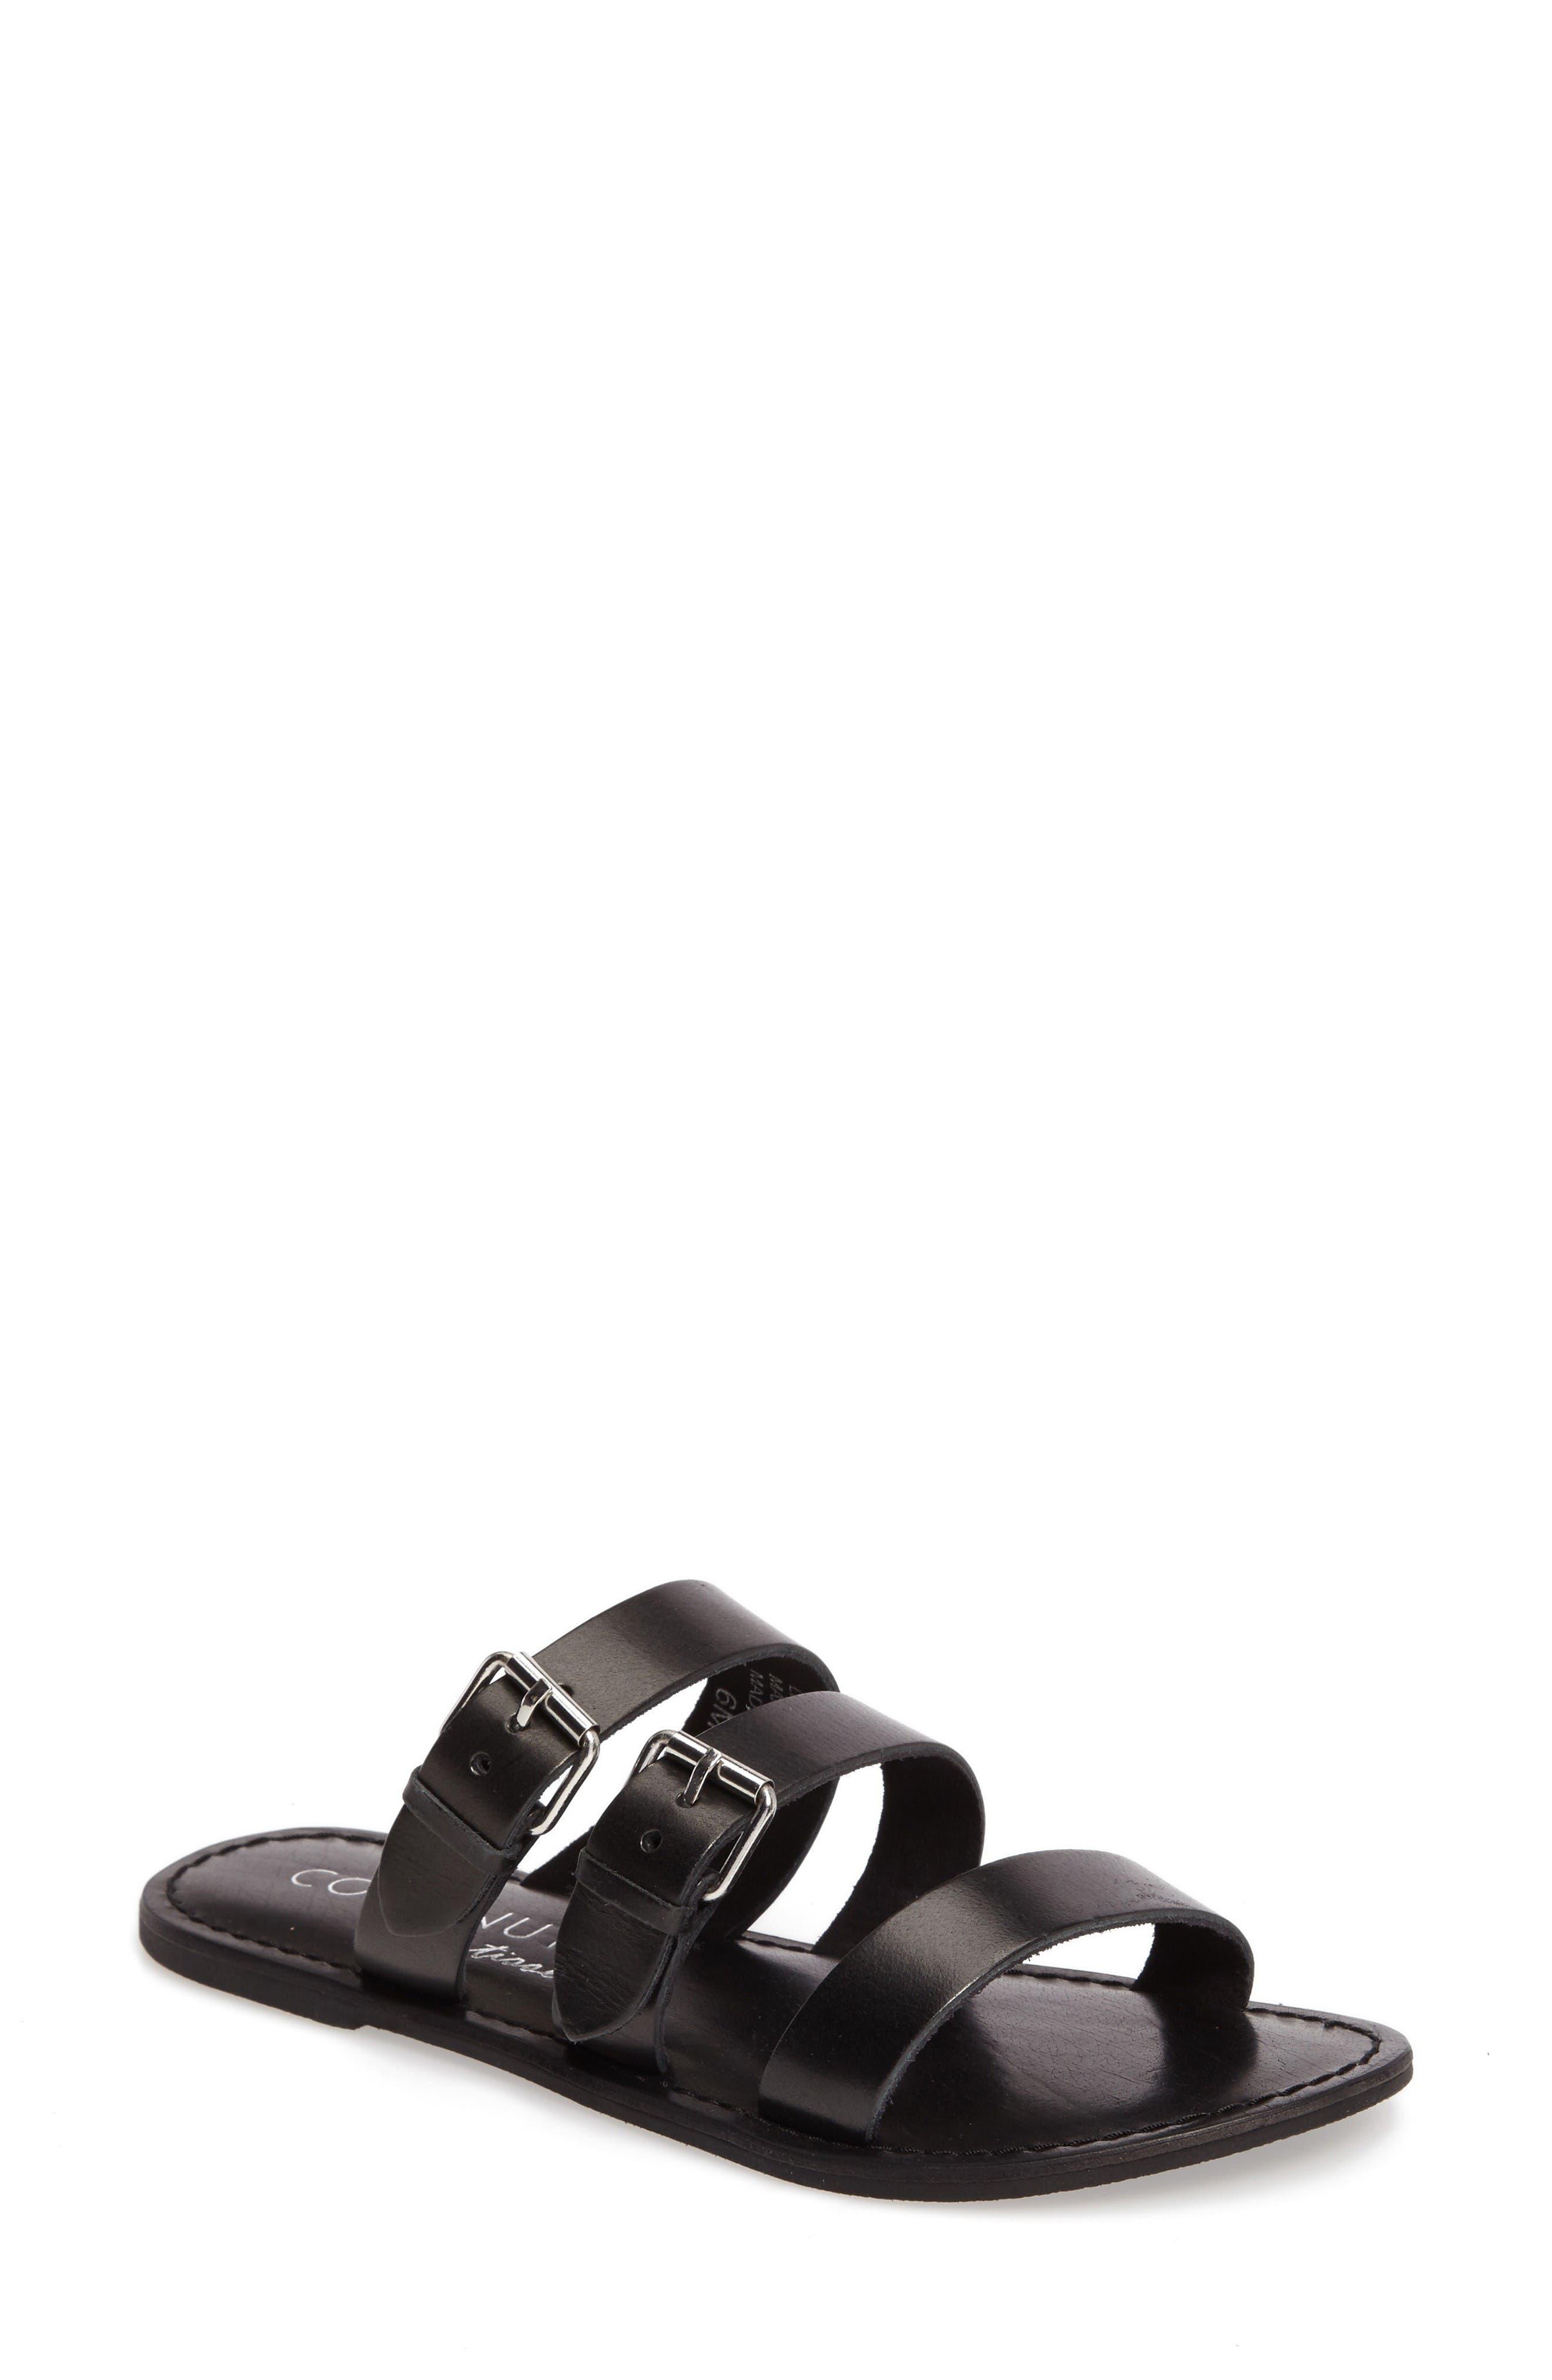 Alternate Image 1 Selected - Matisse Wisp Slide Sandal (Women)